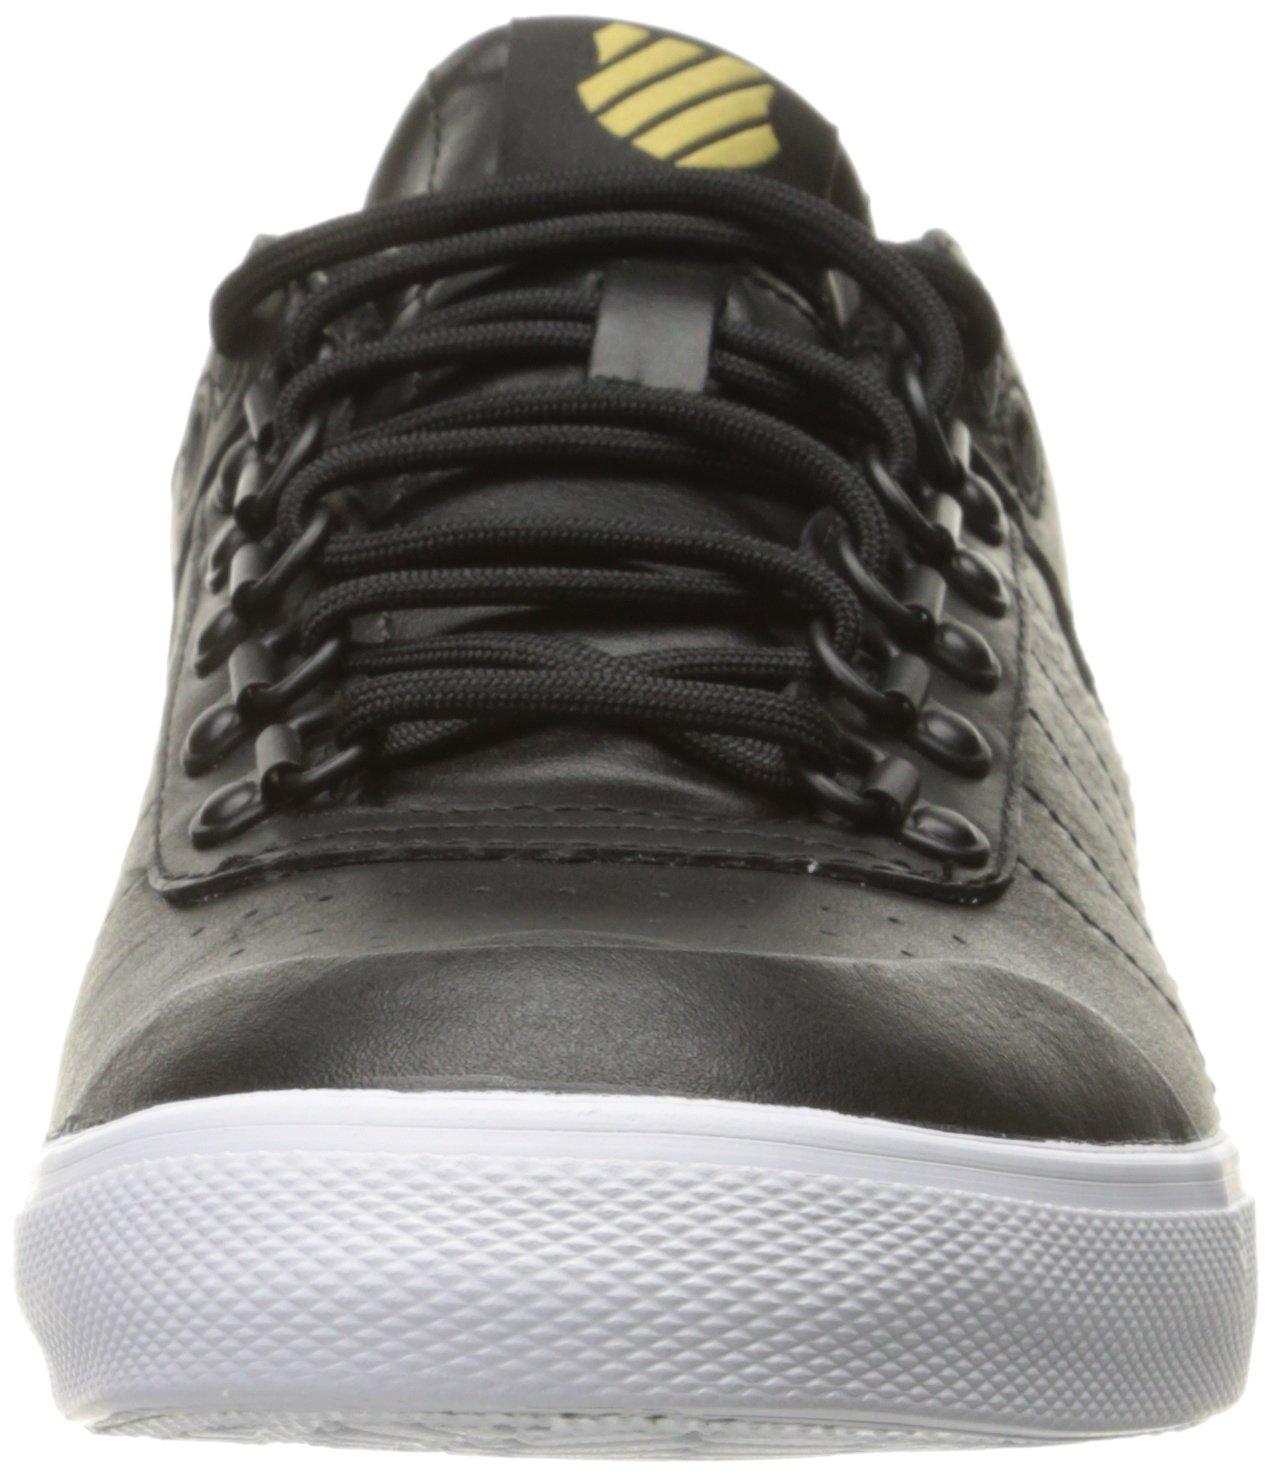 K-Swiss Women's Gstaad Neu Sleek Fashion Sneaker B01K8UBETM 8.5 M US Black/Gold/Eggnog